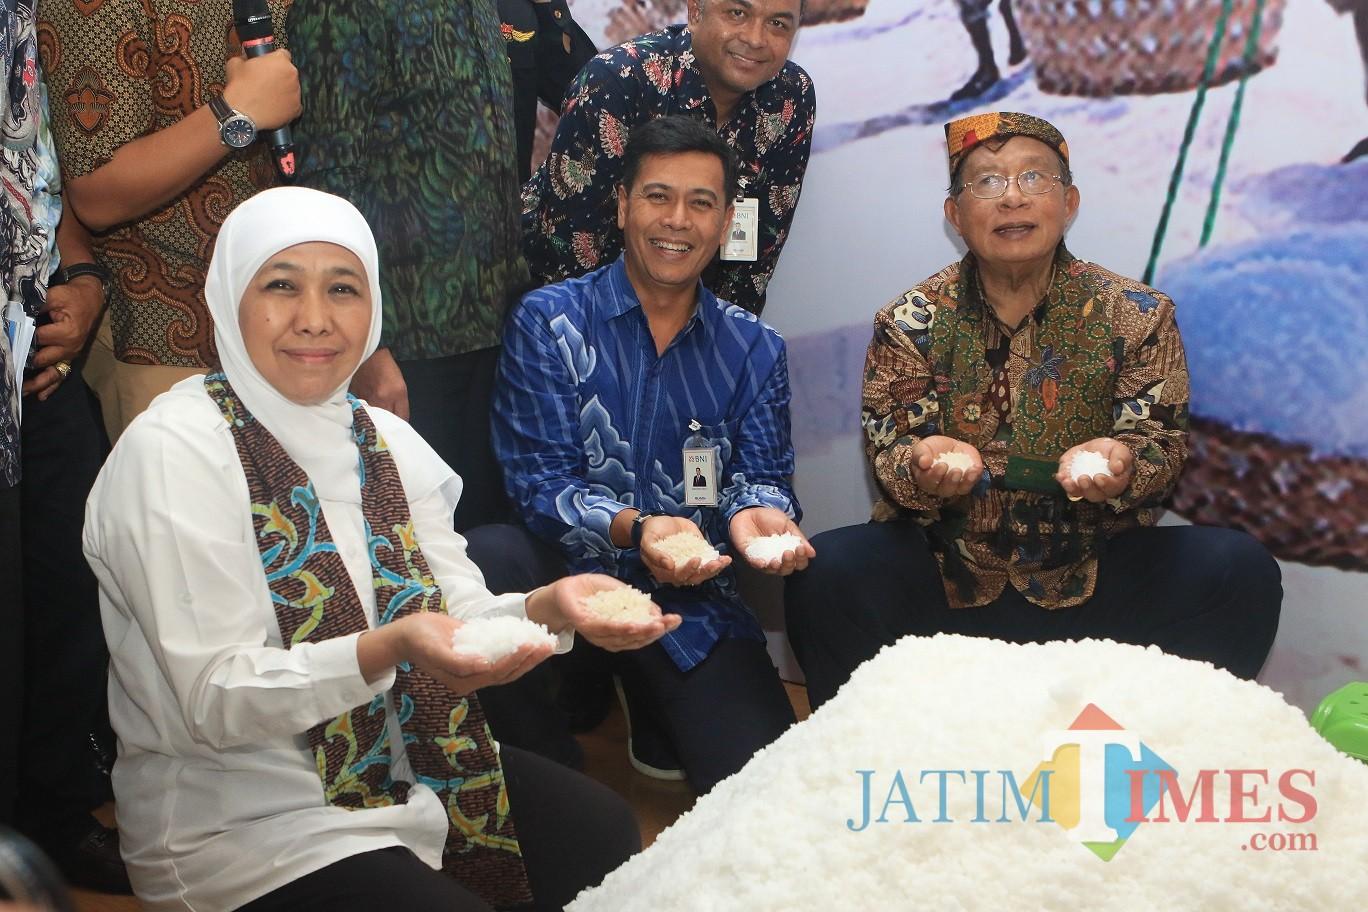 Gubernur Jatim Khofifah Indar Parawansa dalam penyaluran KUR Garam Rakyat di Lapangan Bunder, Kecamatan Pademawu, Kabupaten Pamekasan, Sabtu (13/4).